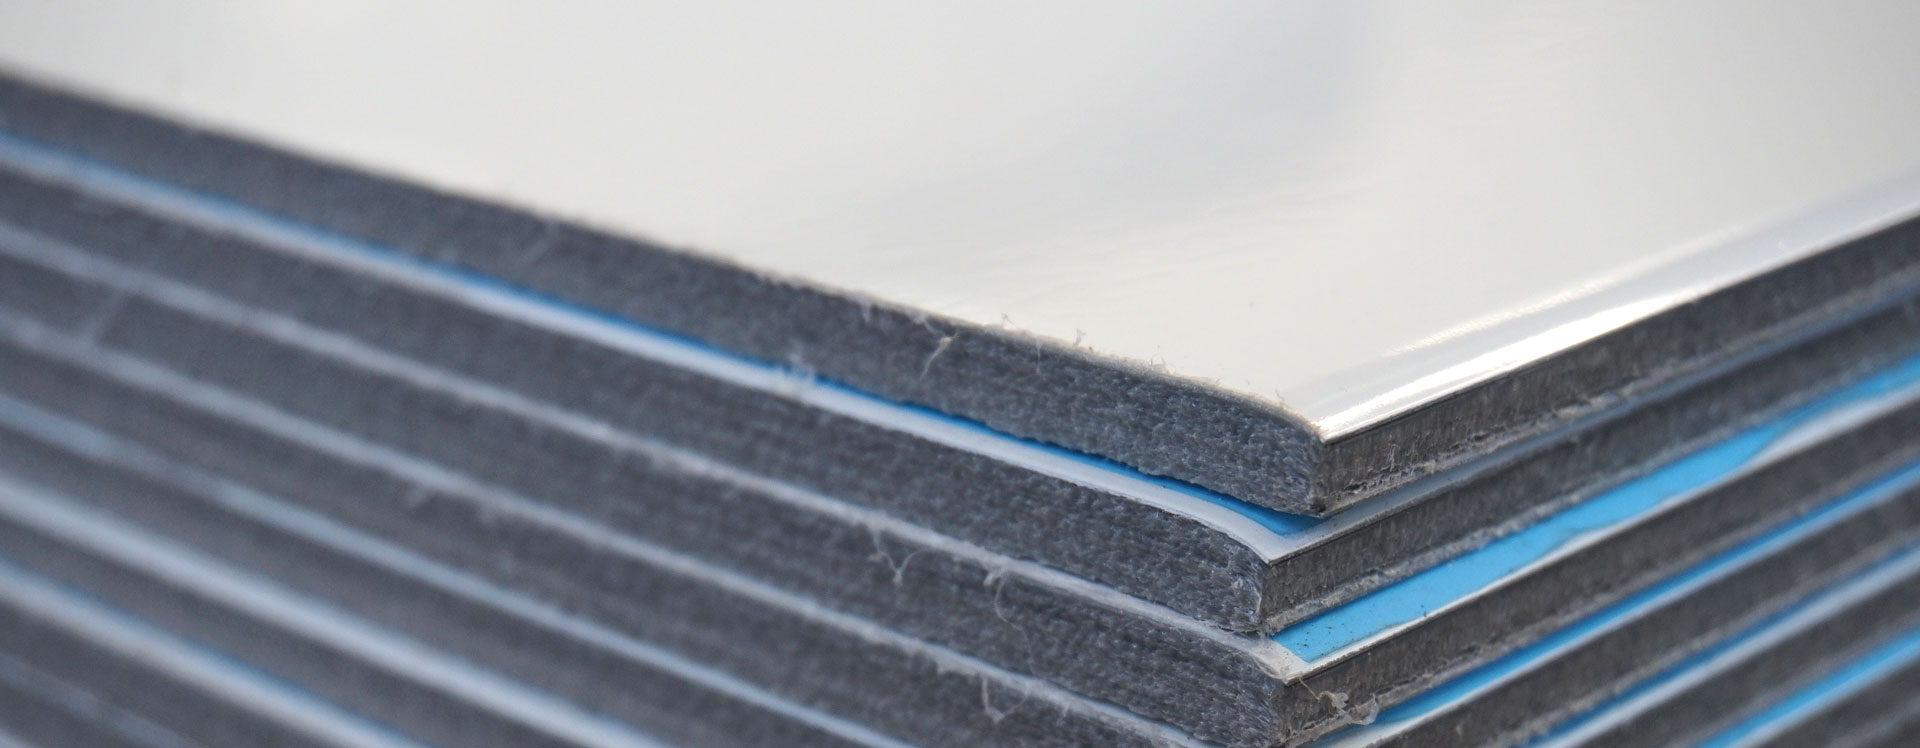 Blade Panel